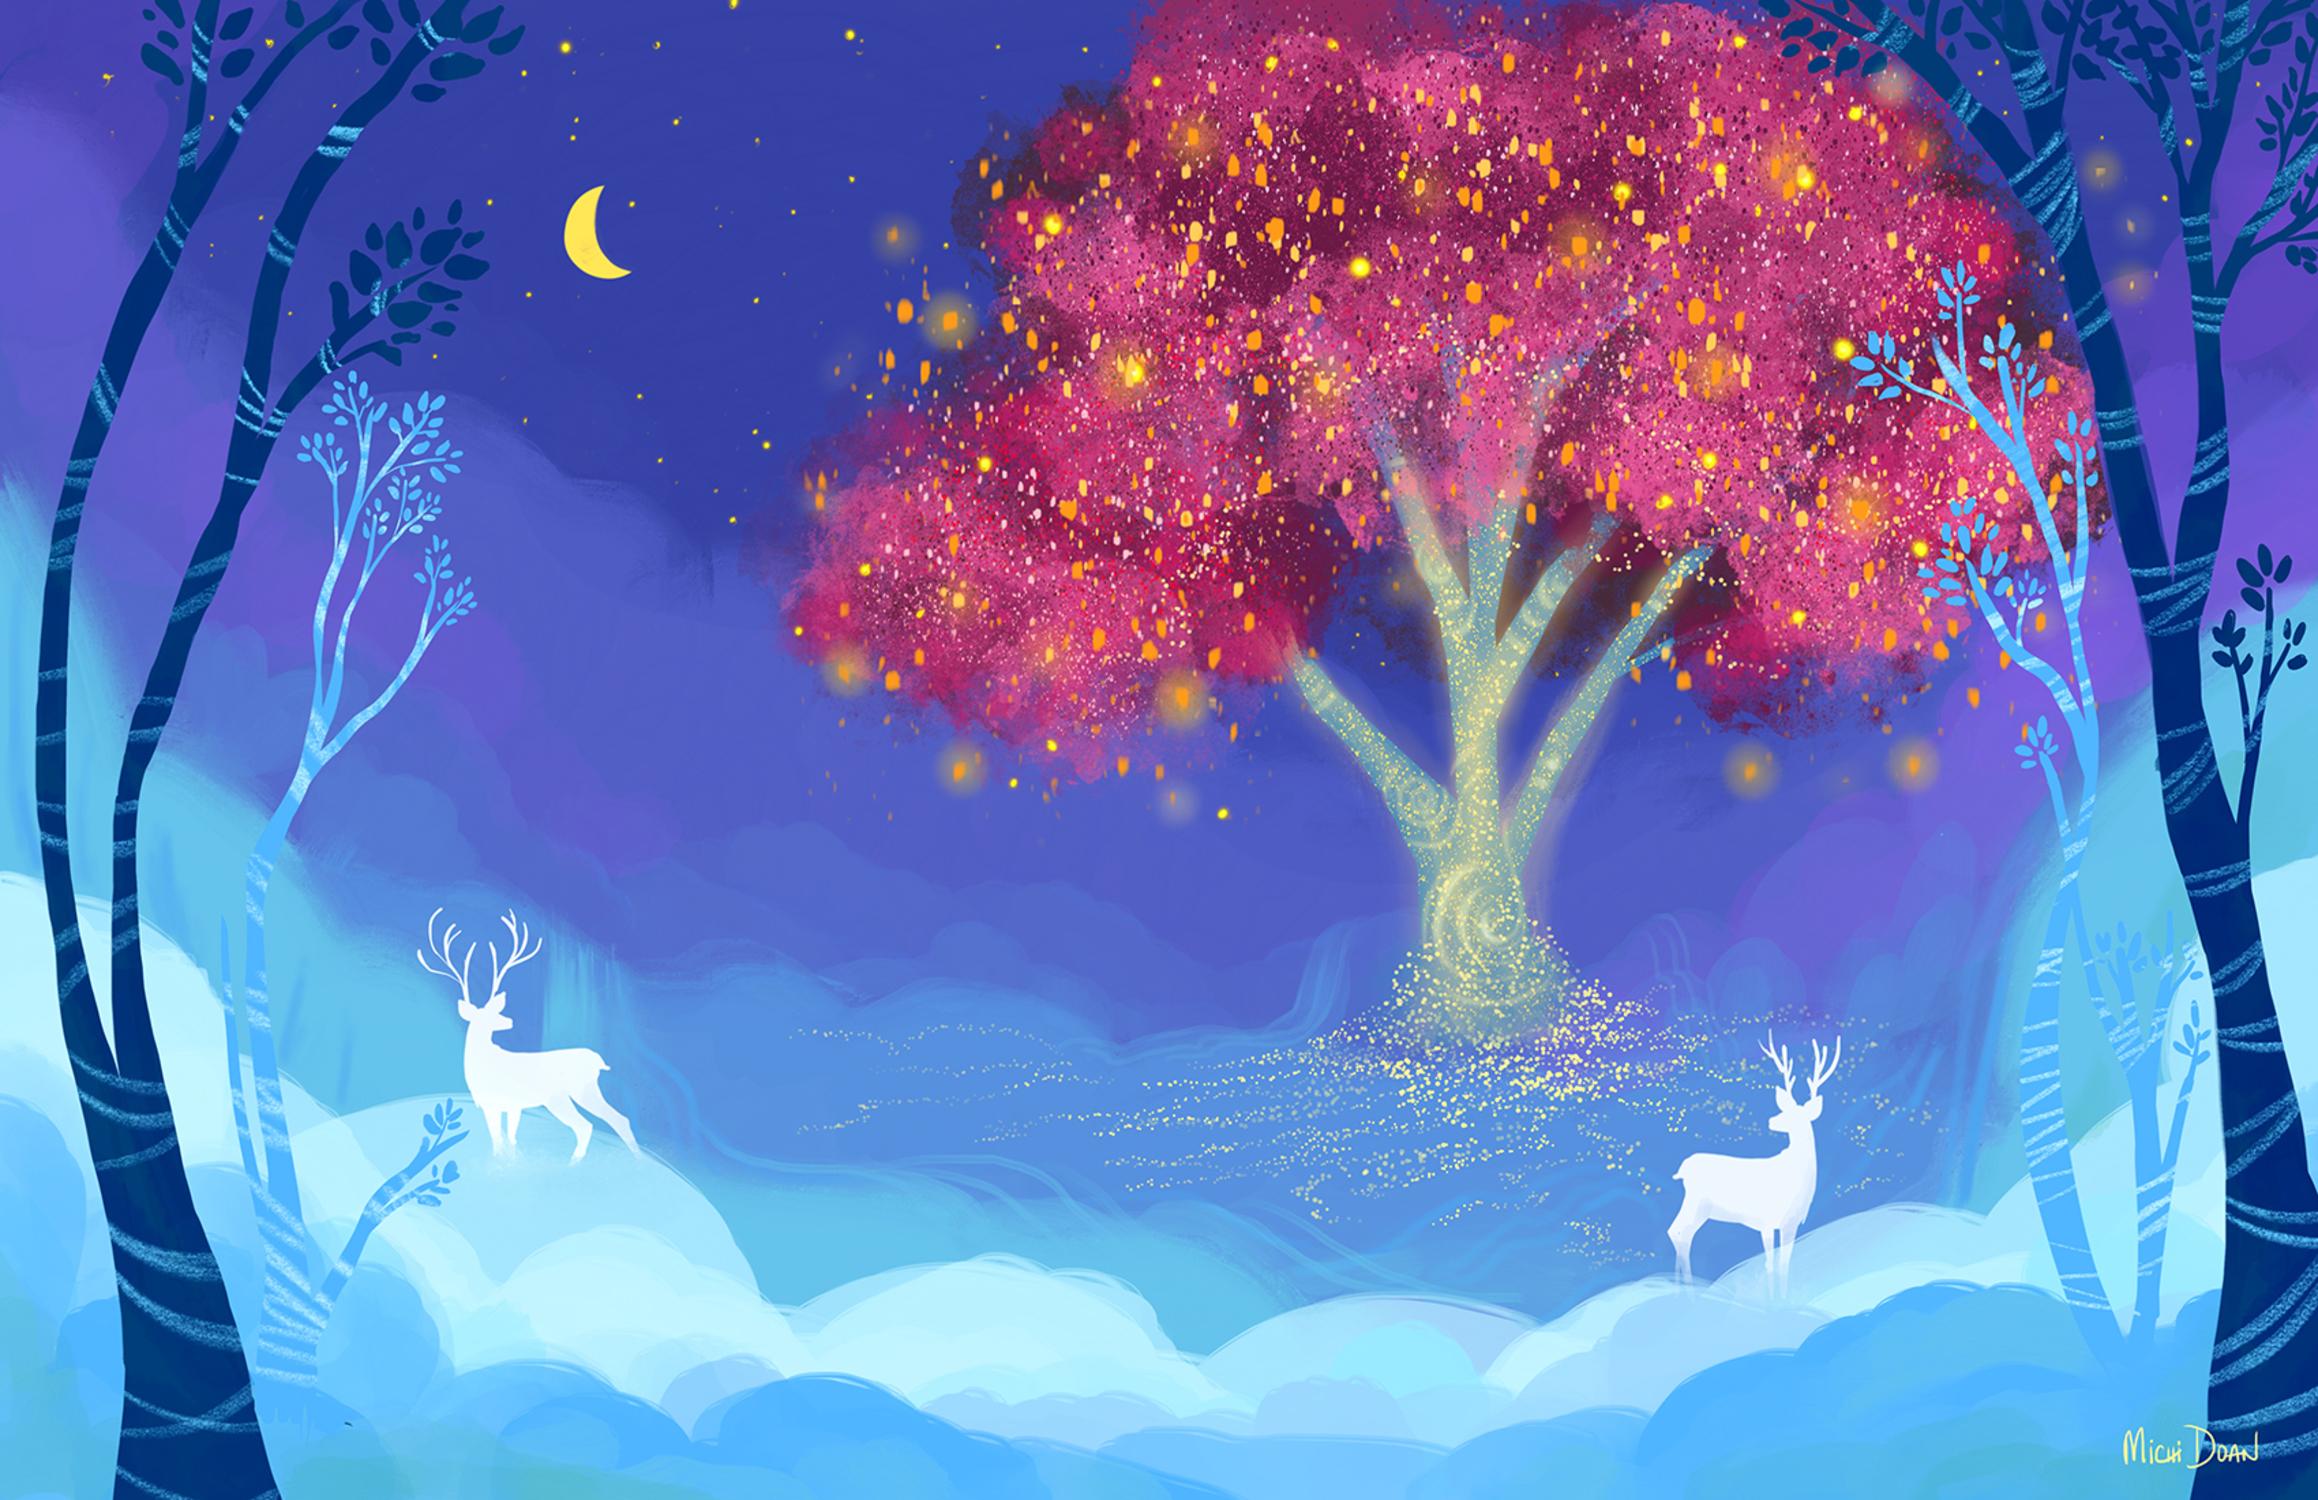 Wishing Tree Artwork by Michi Doan